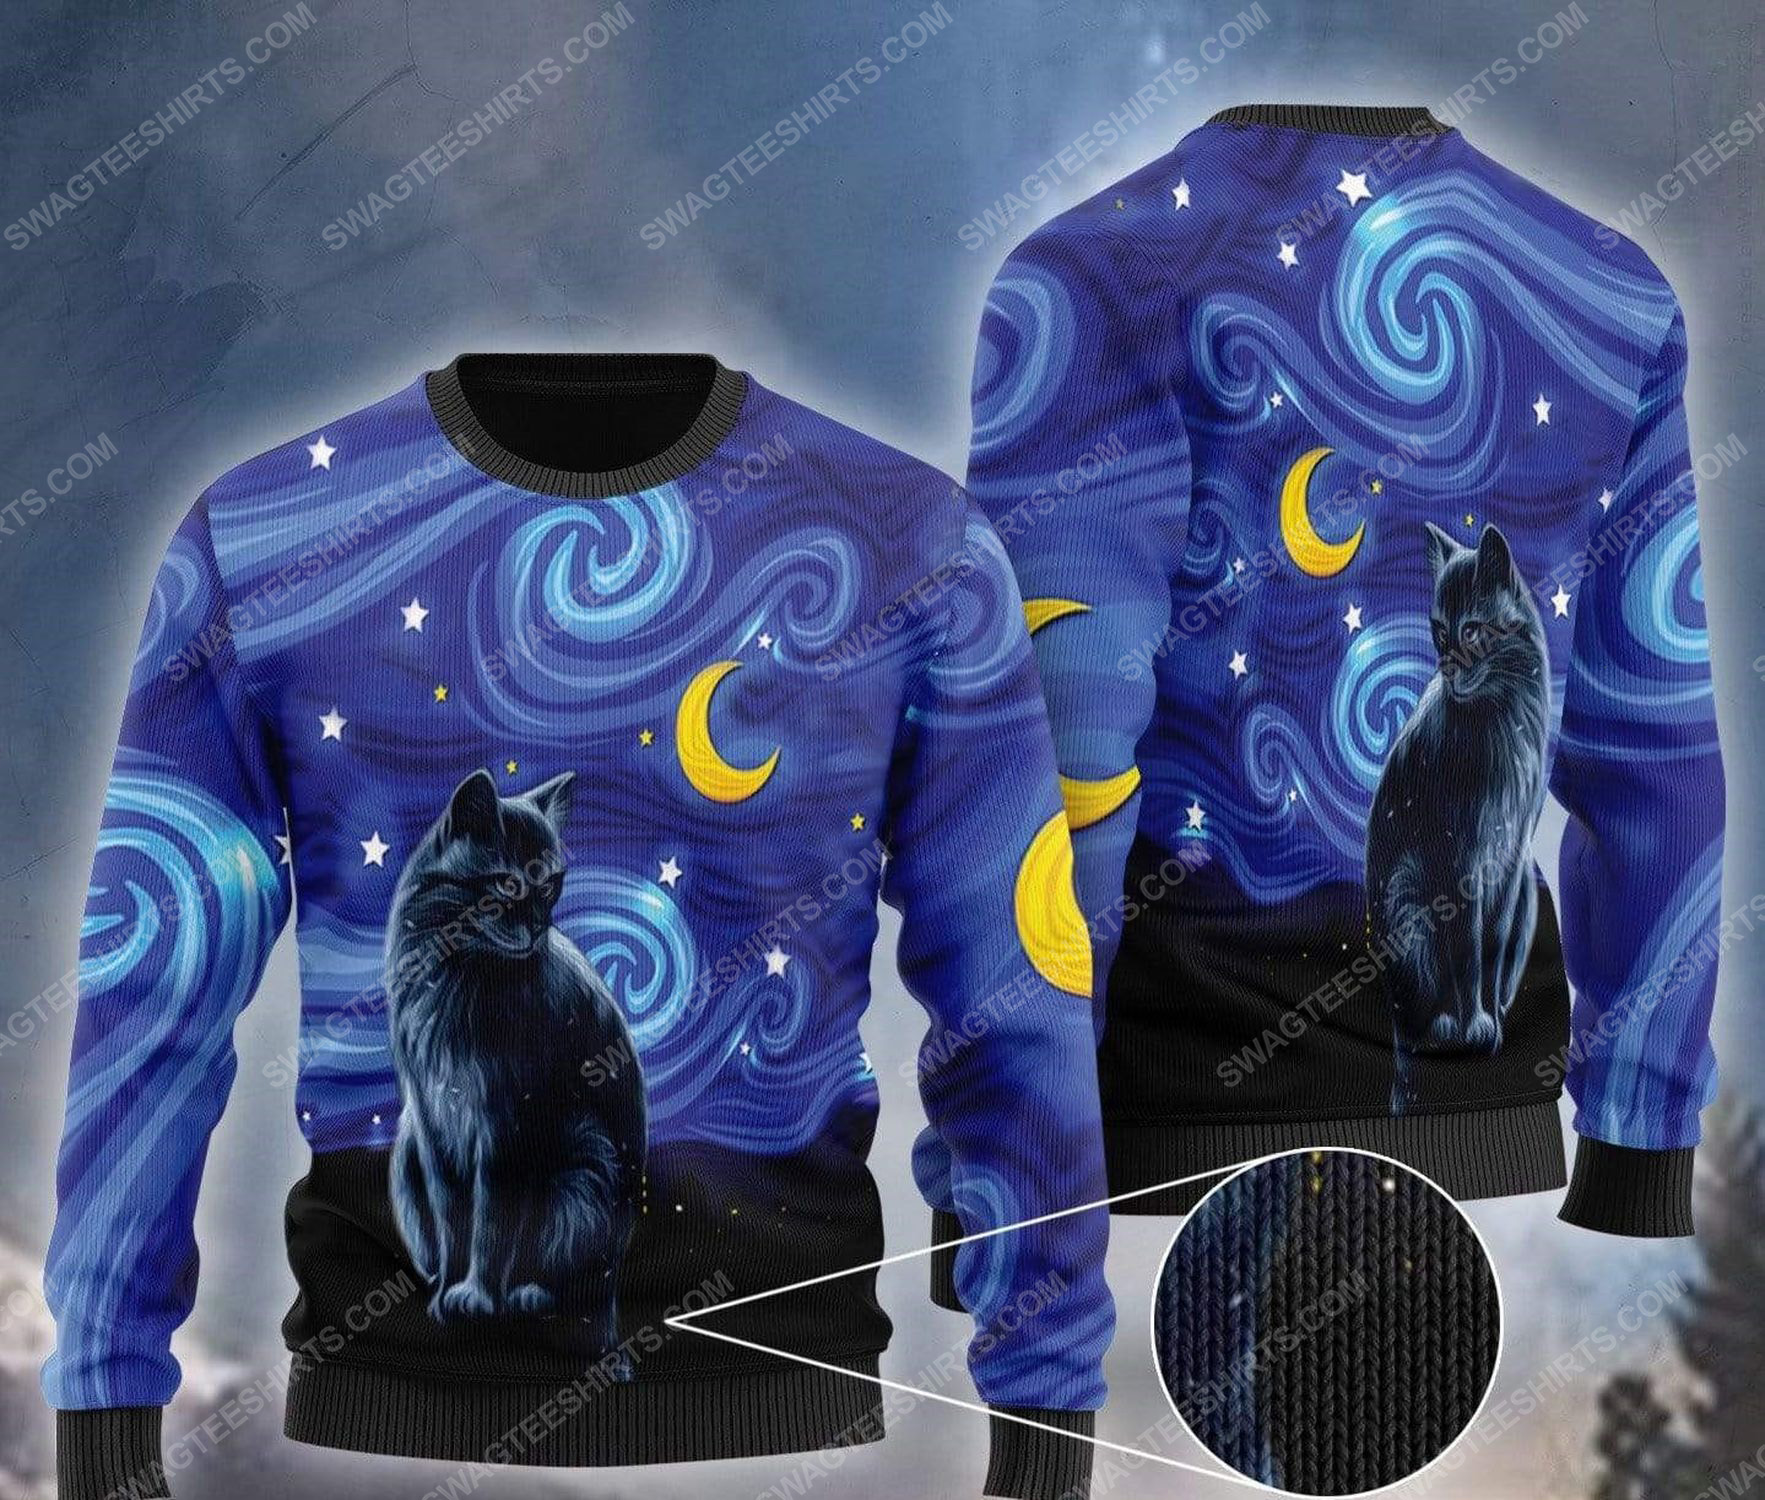 Black cat vincent van gogh starry night ugly christmas sweater 1 - Copy - Copy